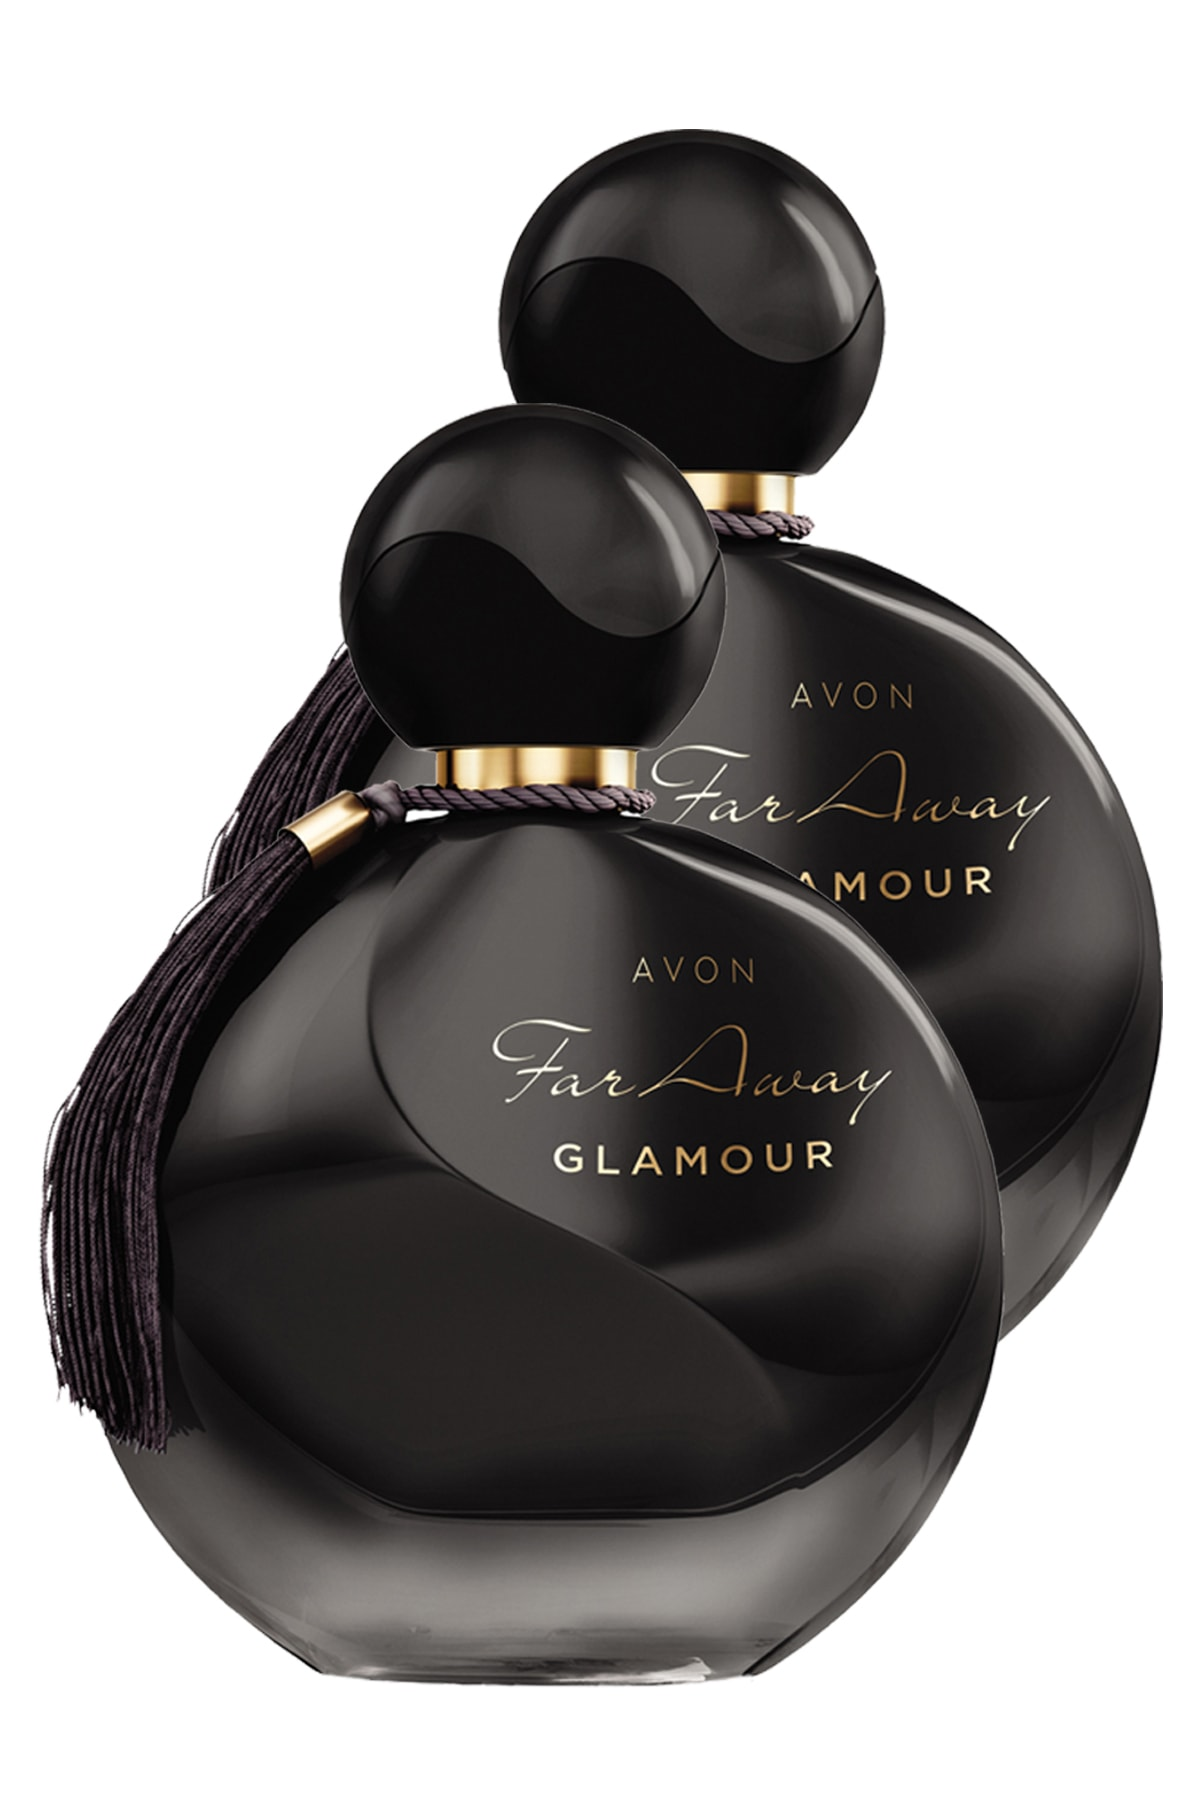 Avon Far Away Glamour Kadın Parfüm Edp 50 ml 2'li Set 5050000102414 0